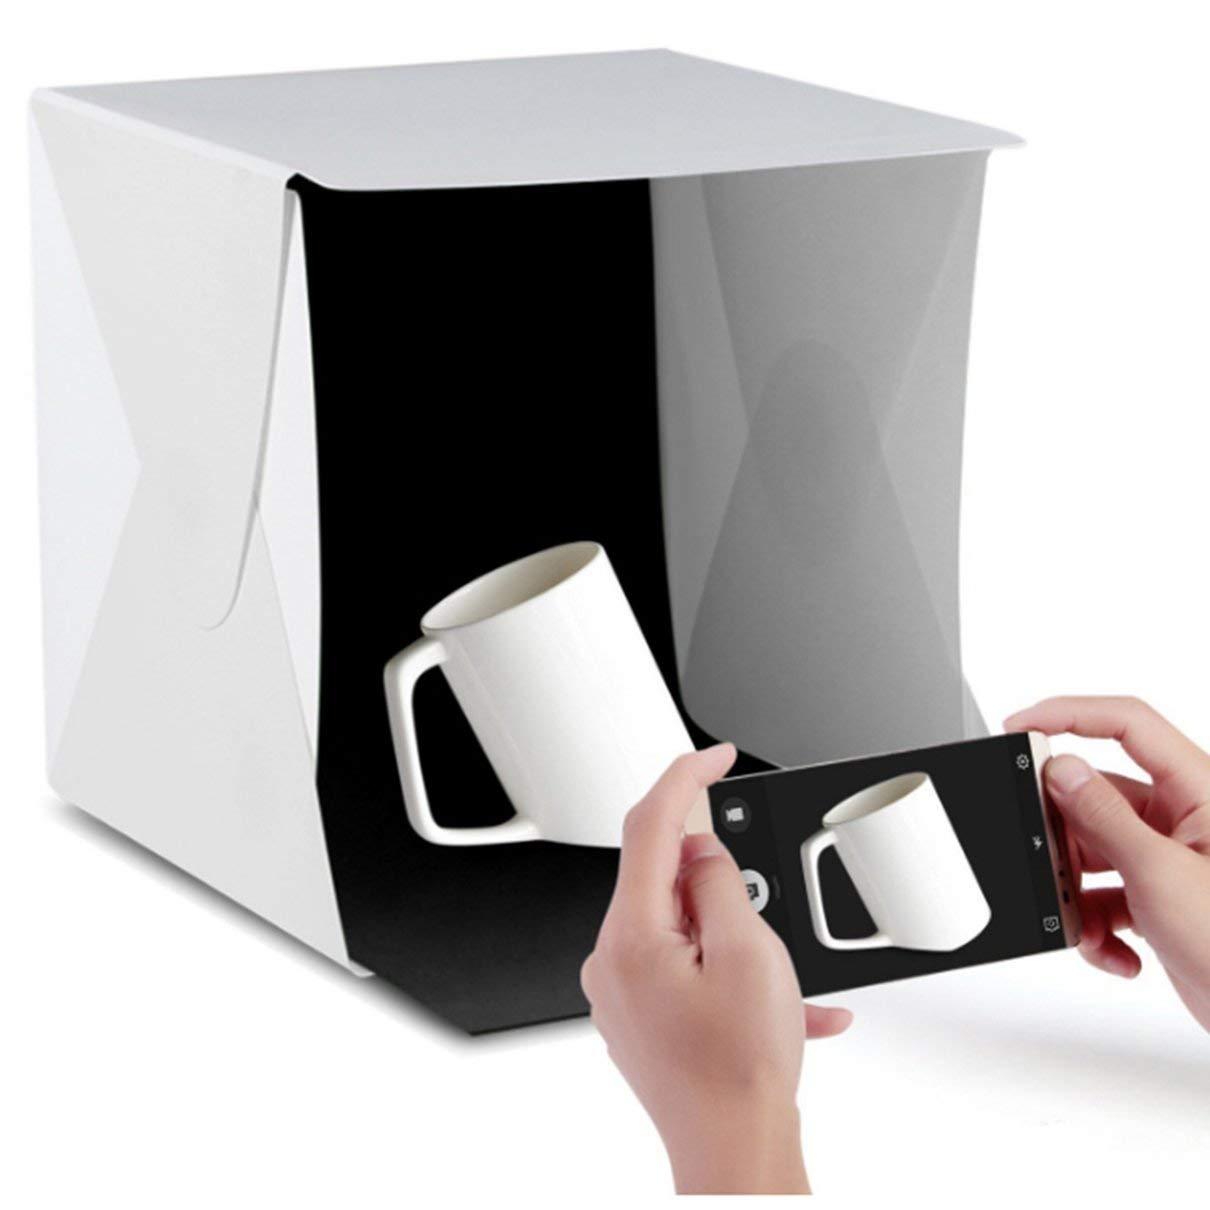 Kit de fotograf/ía de caja de luz port/átil de tienda ligera con luz LED 4 colores de fondo 12X12X12 pulgadas